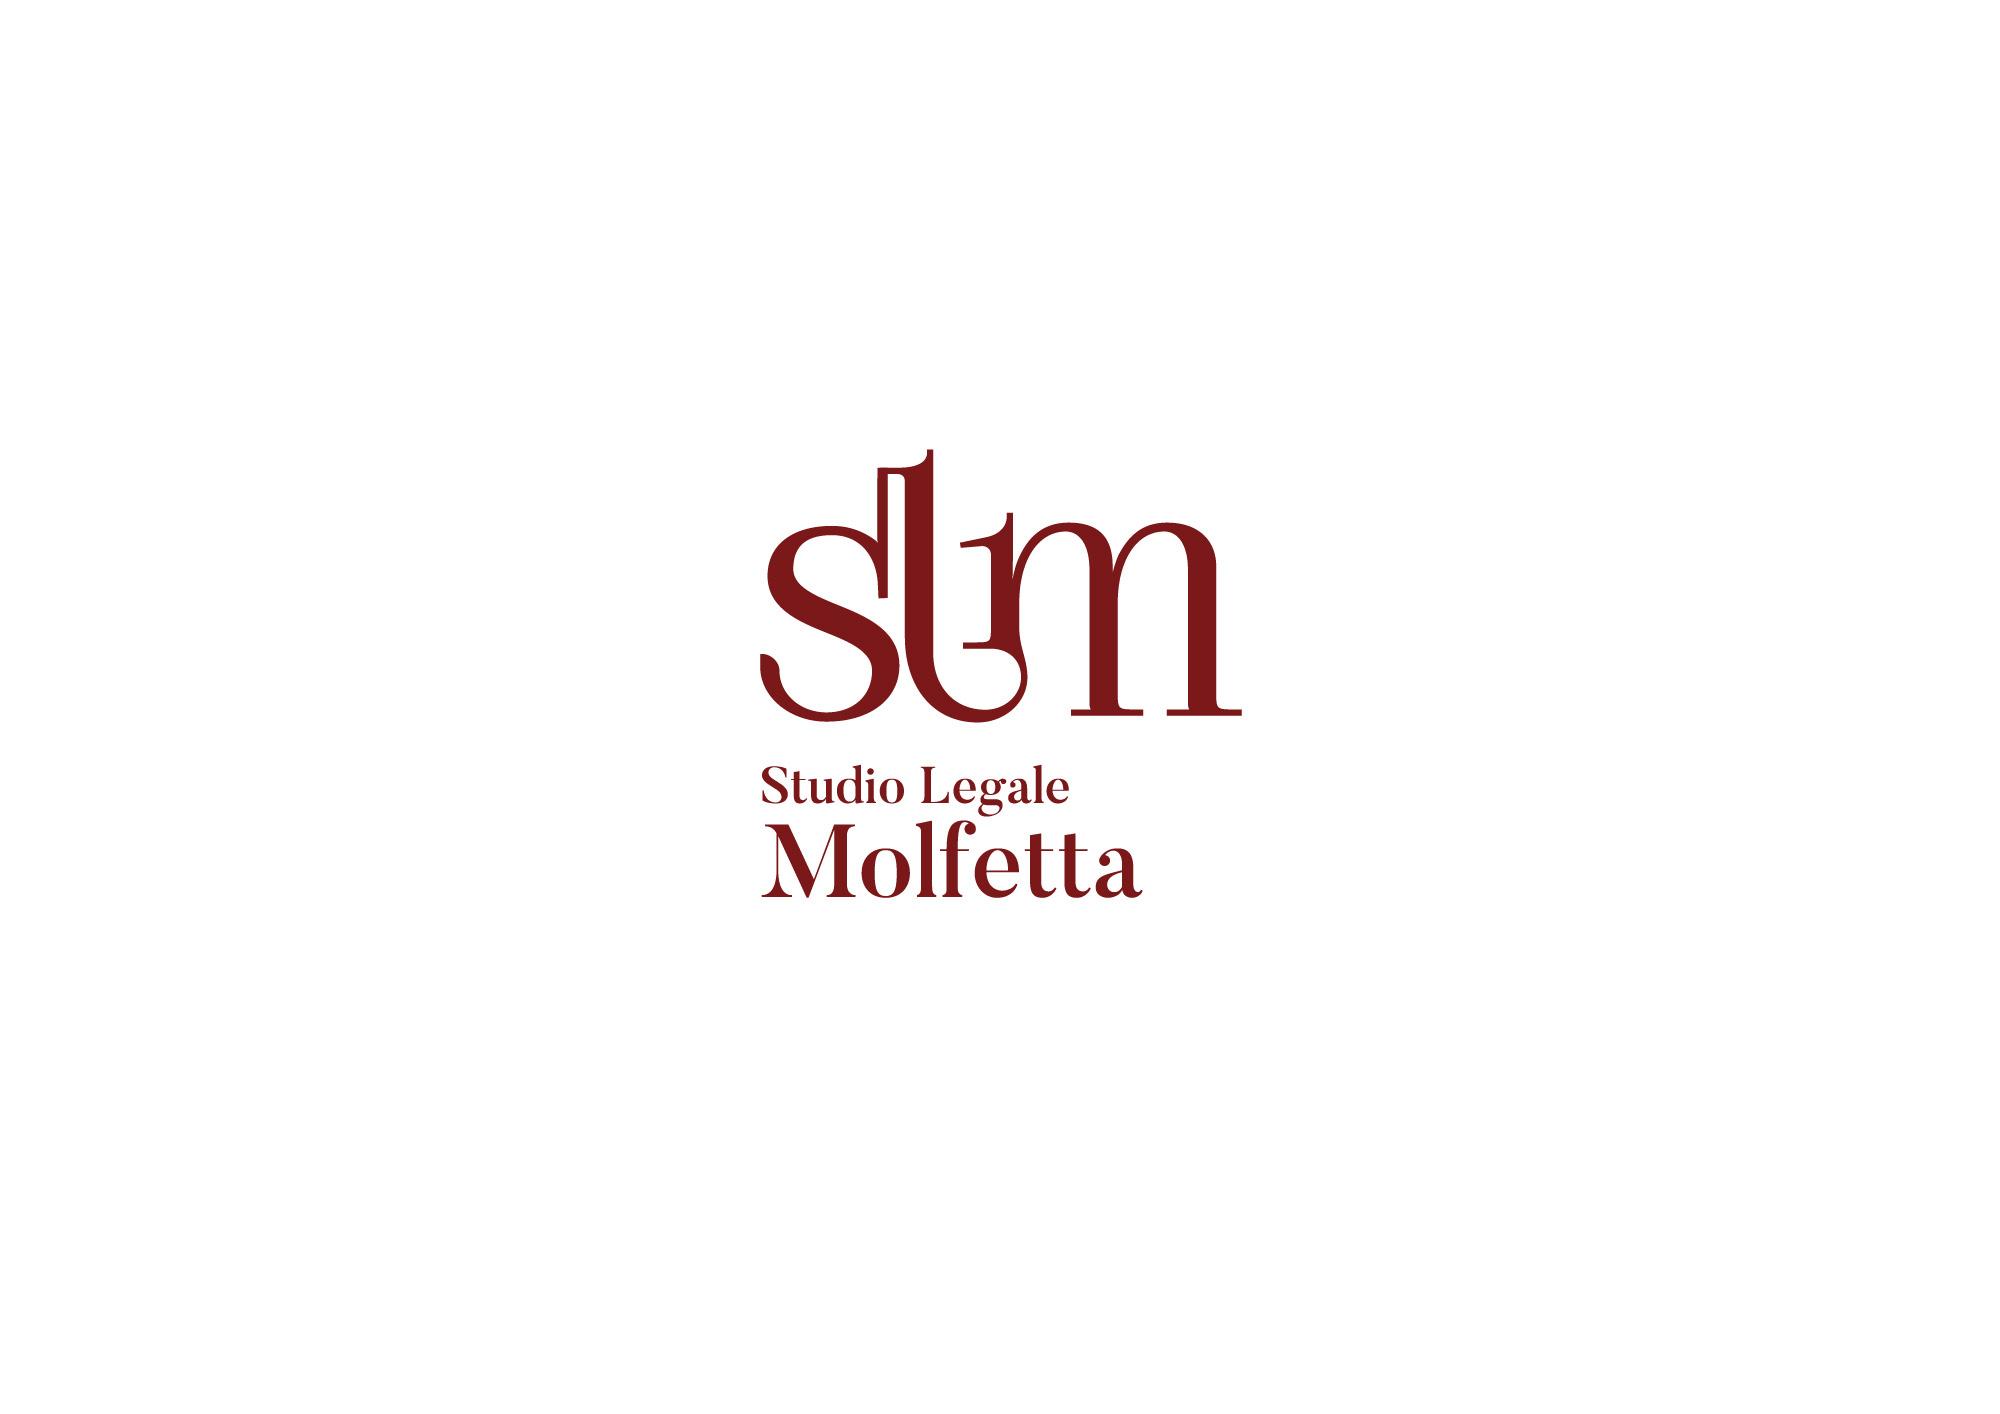 Studio Legale Molfetta - logo, branding, print - img 1